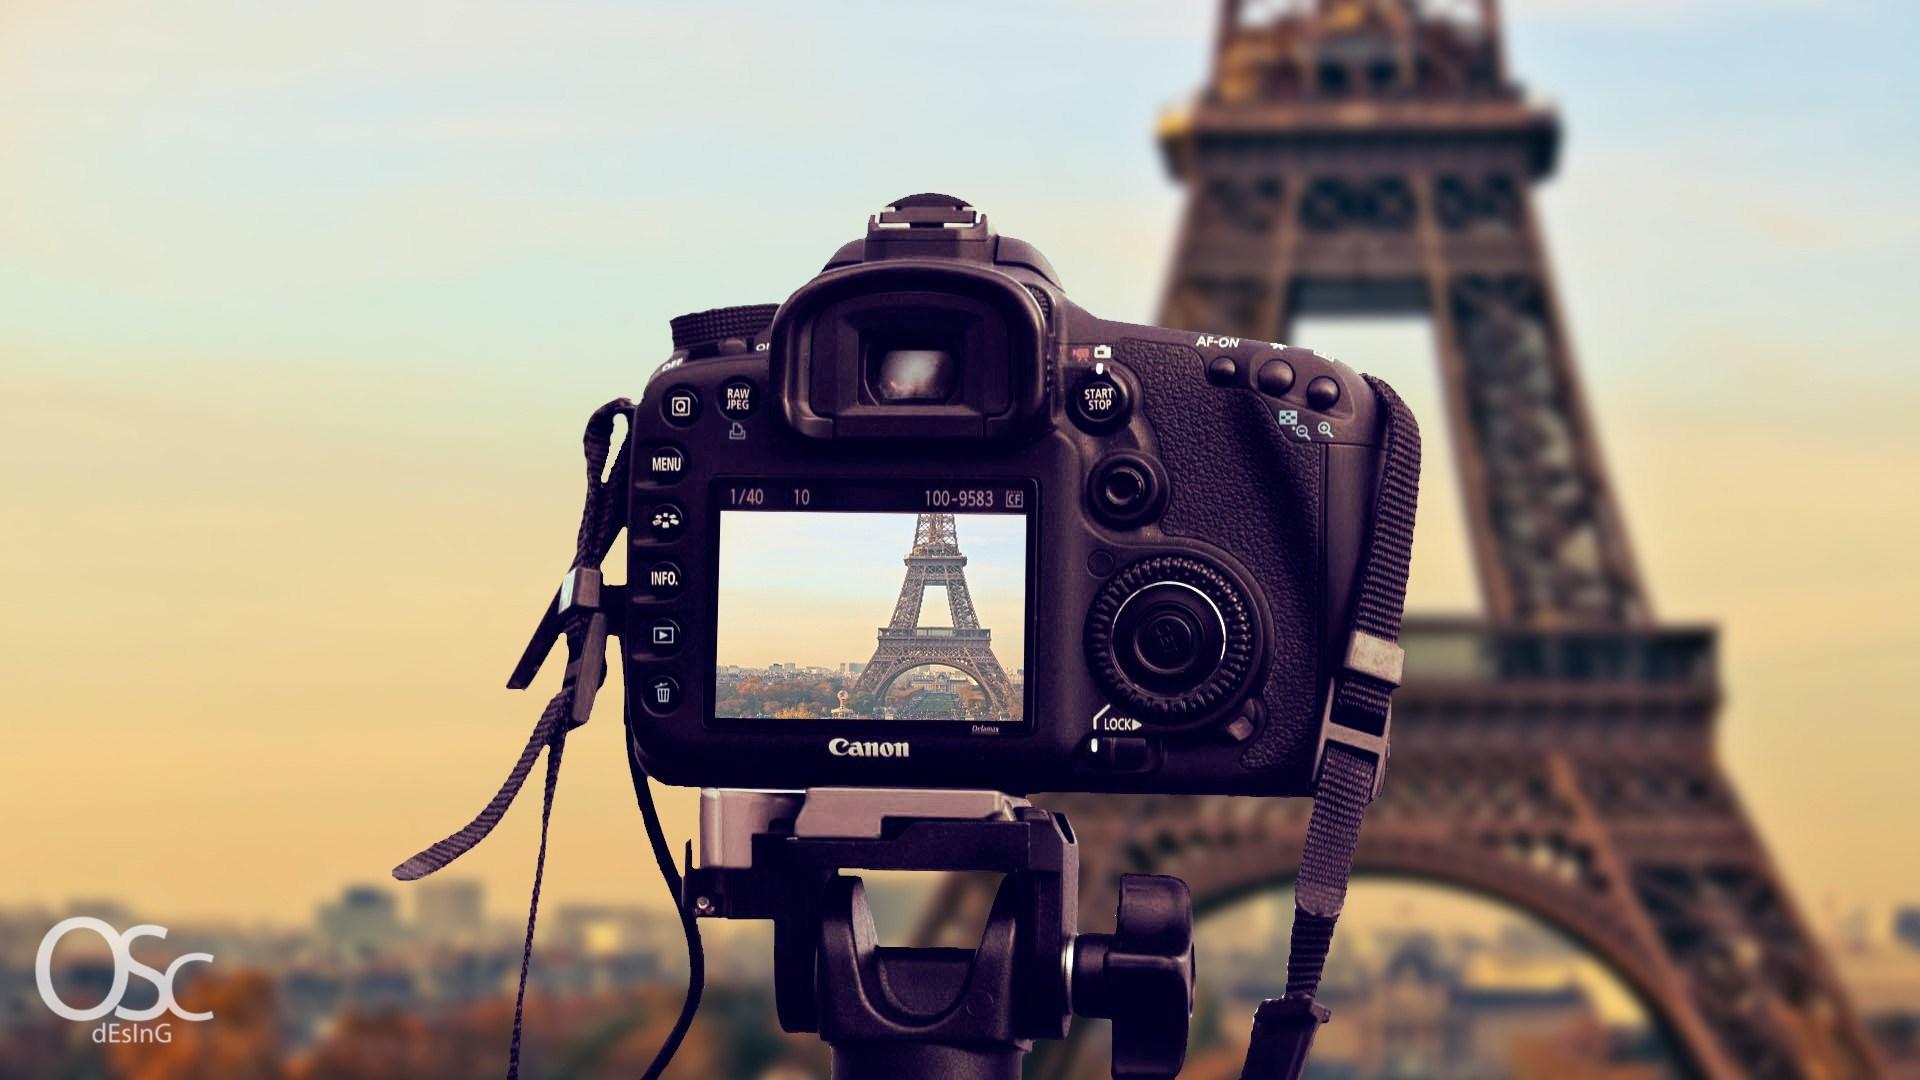 Camera Wallpaper HD Wallpapers Backgrounds 1920x1080